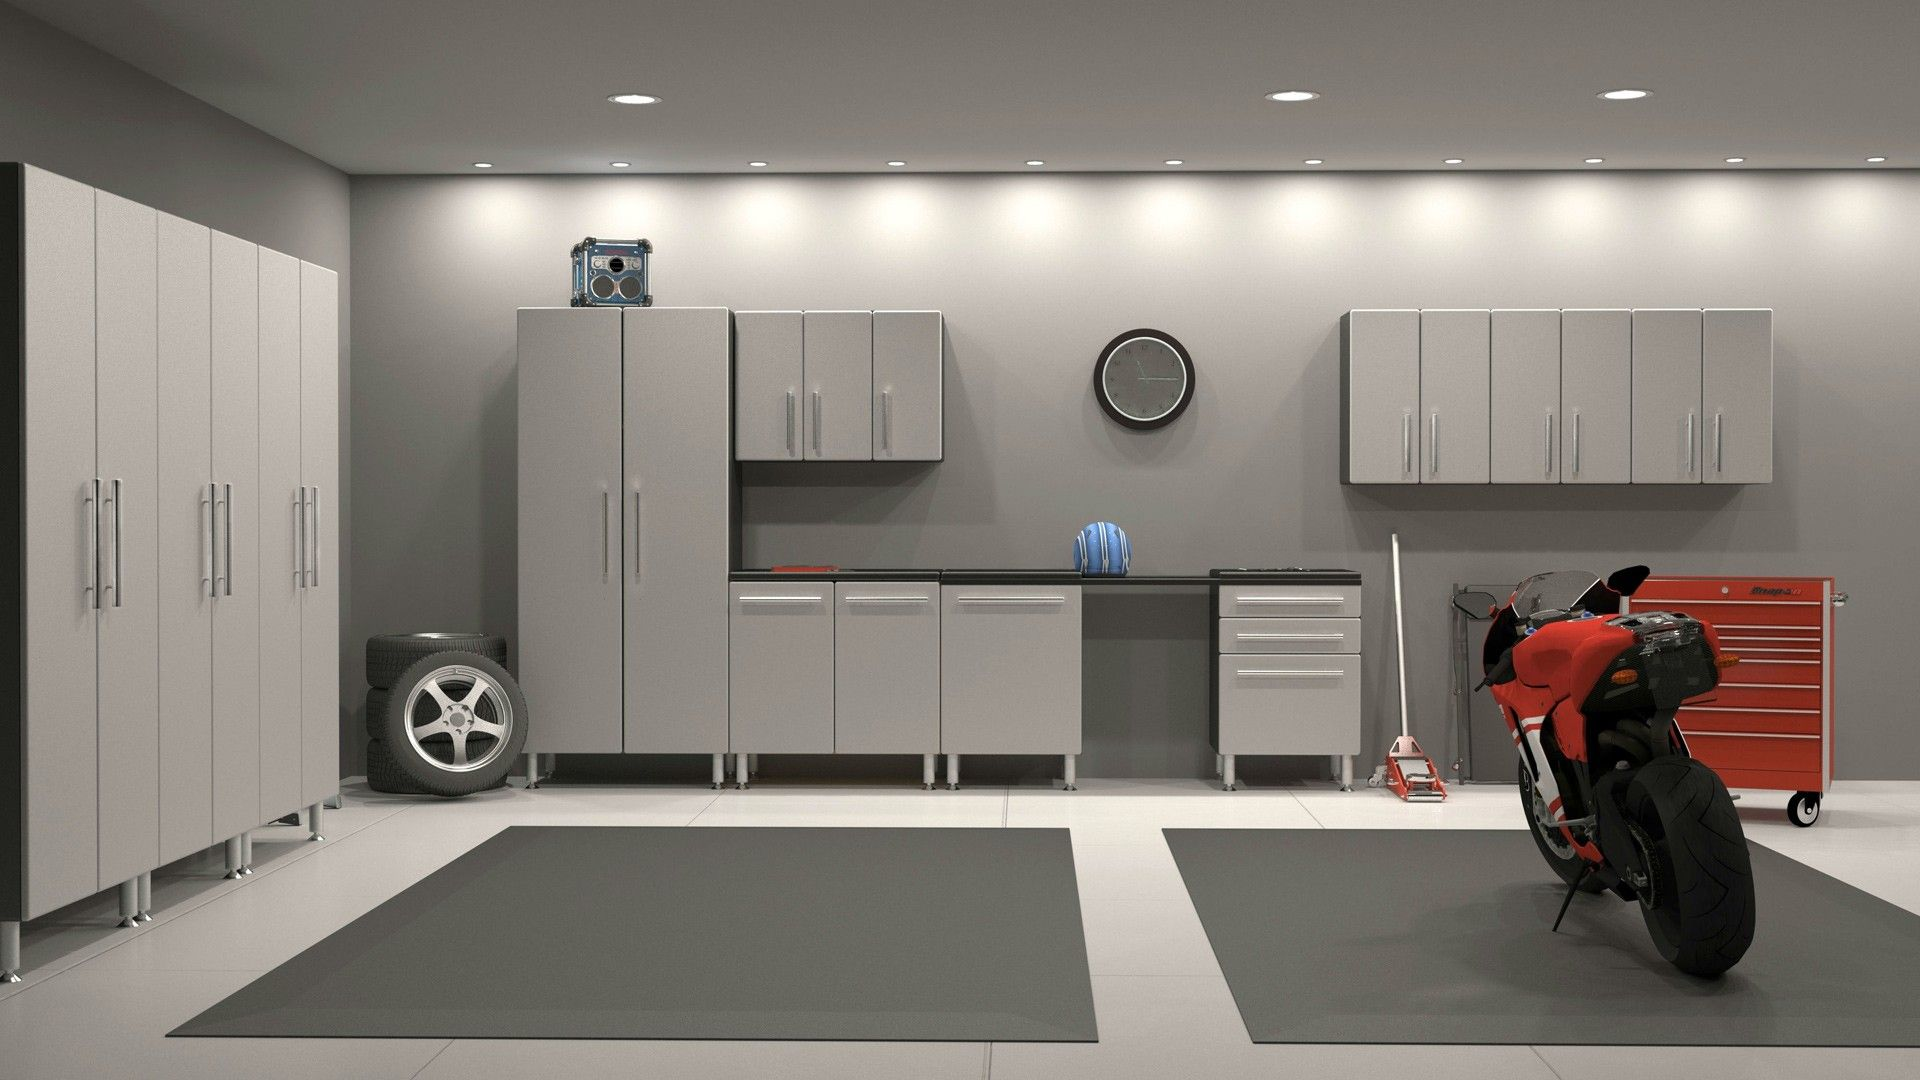 Garage Remodeling Ideas House Architecture Design Garage